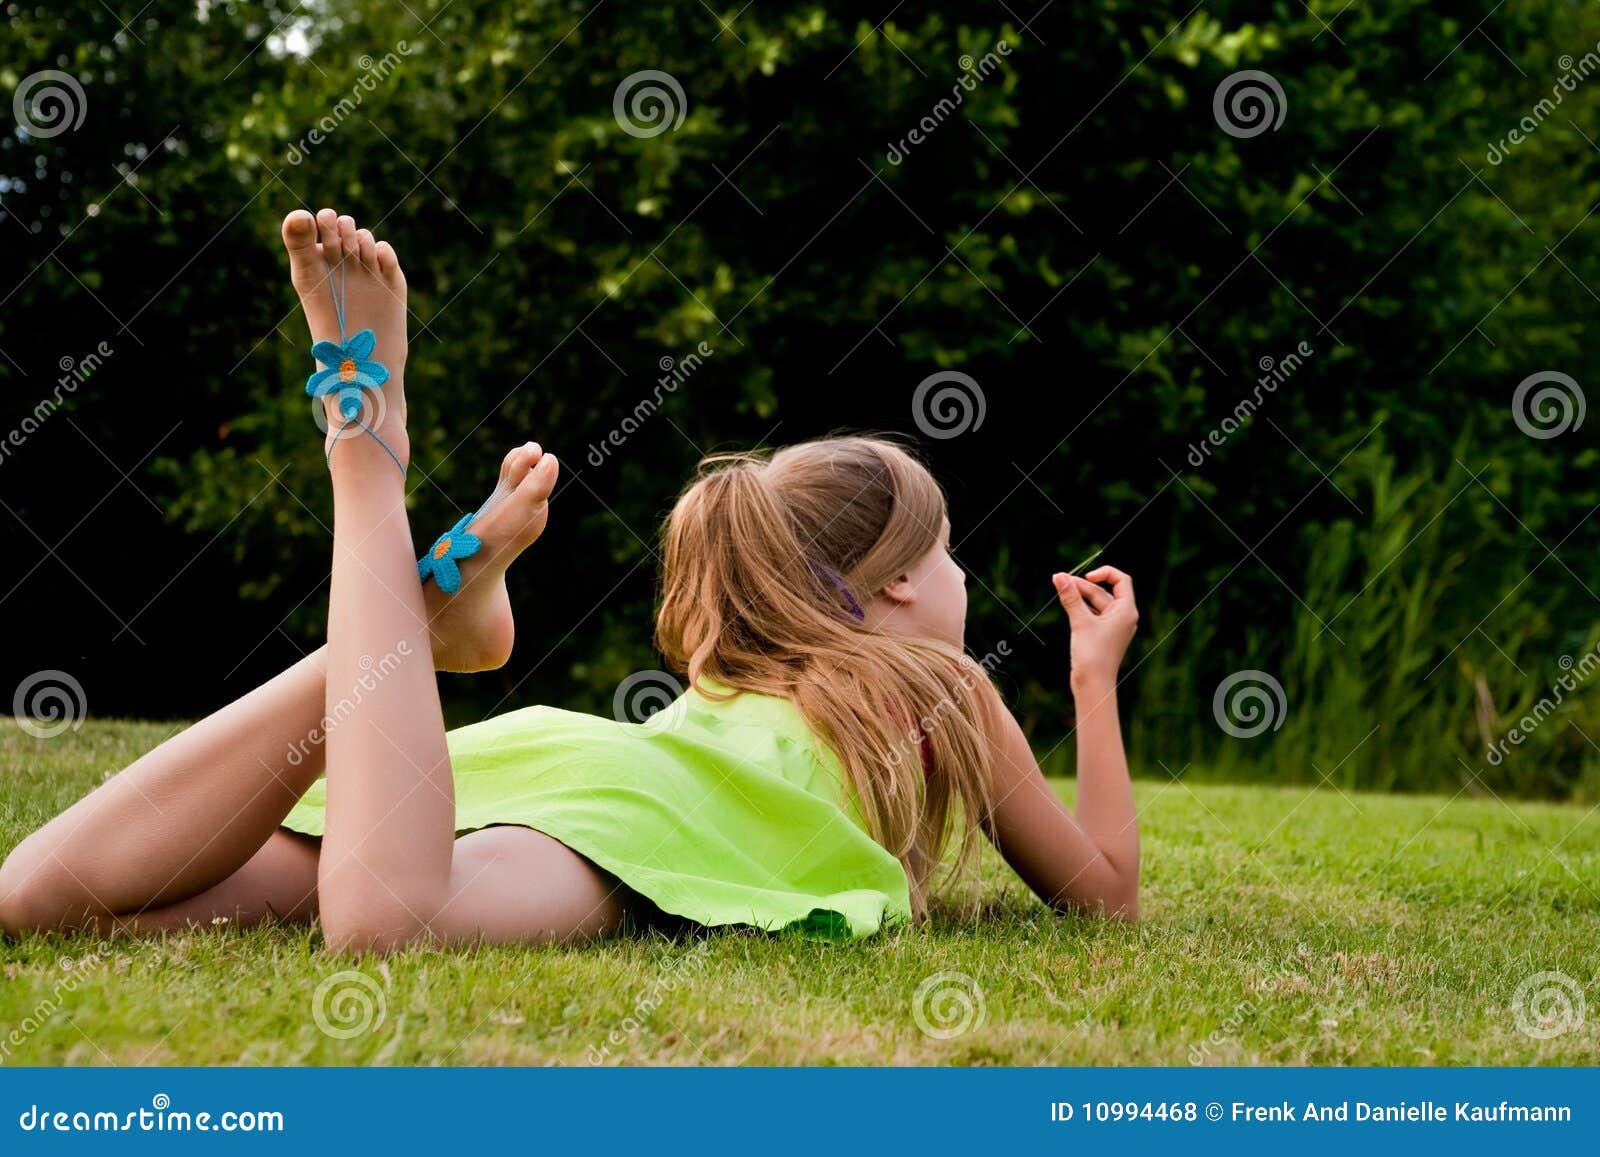 Teenager picknick